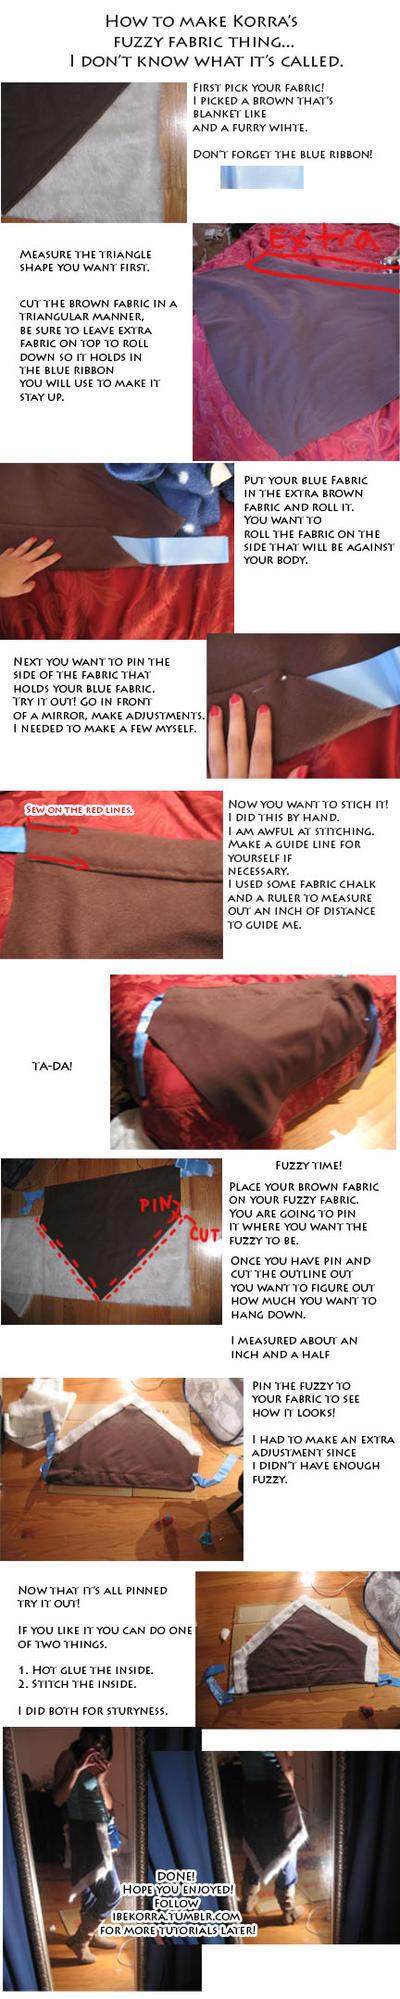 Korra Fuzzy Thing tutorial by Naiagu